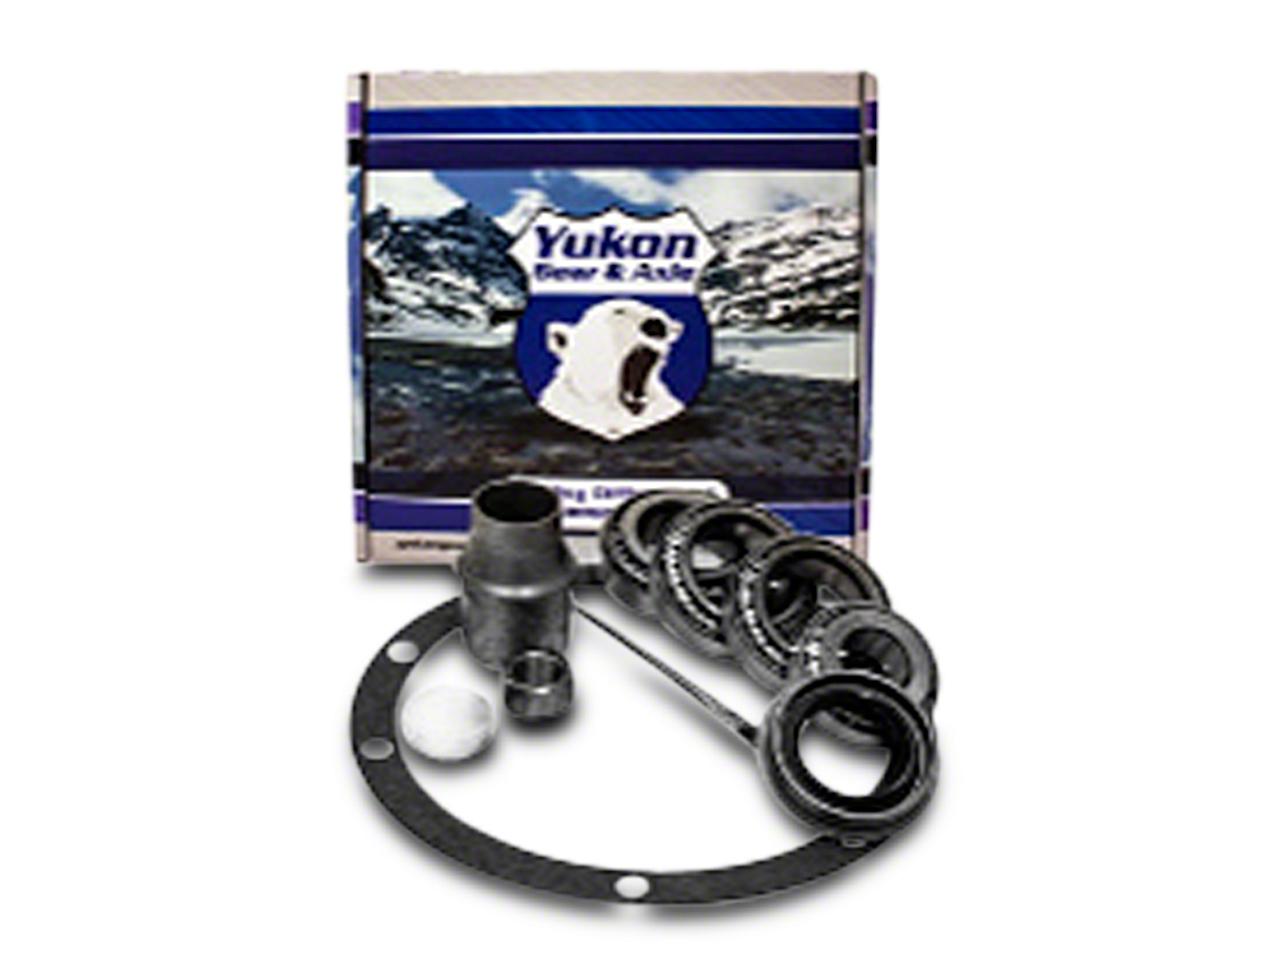 Yukon Gear Dana 30 Bearing Internal Kit (87-06 Jeep Wrangler YJ, TJ)